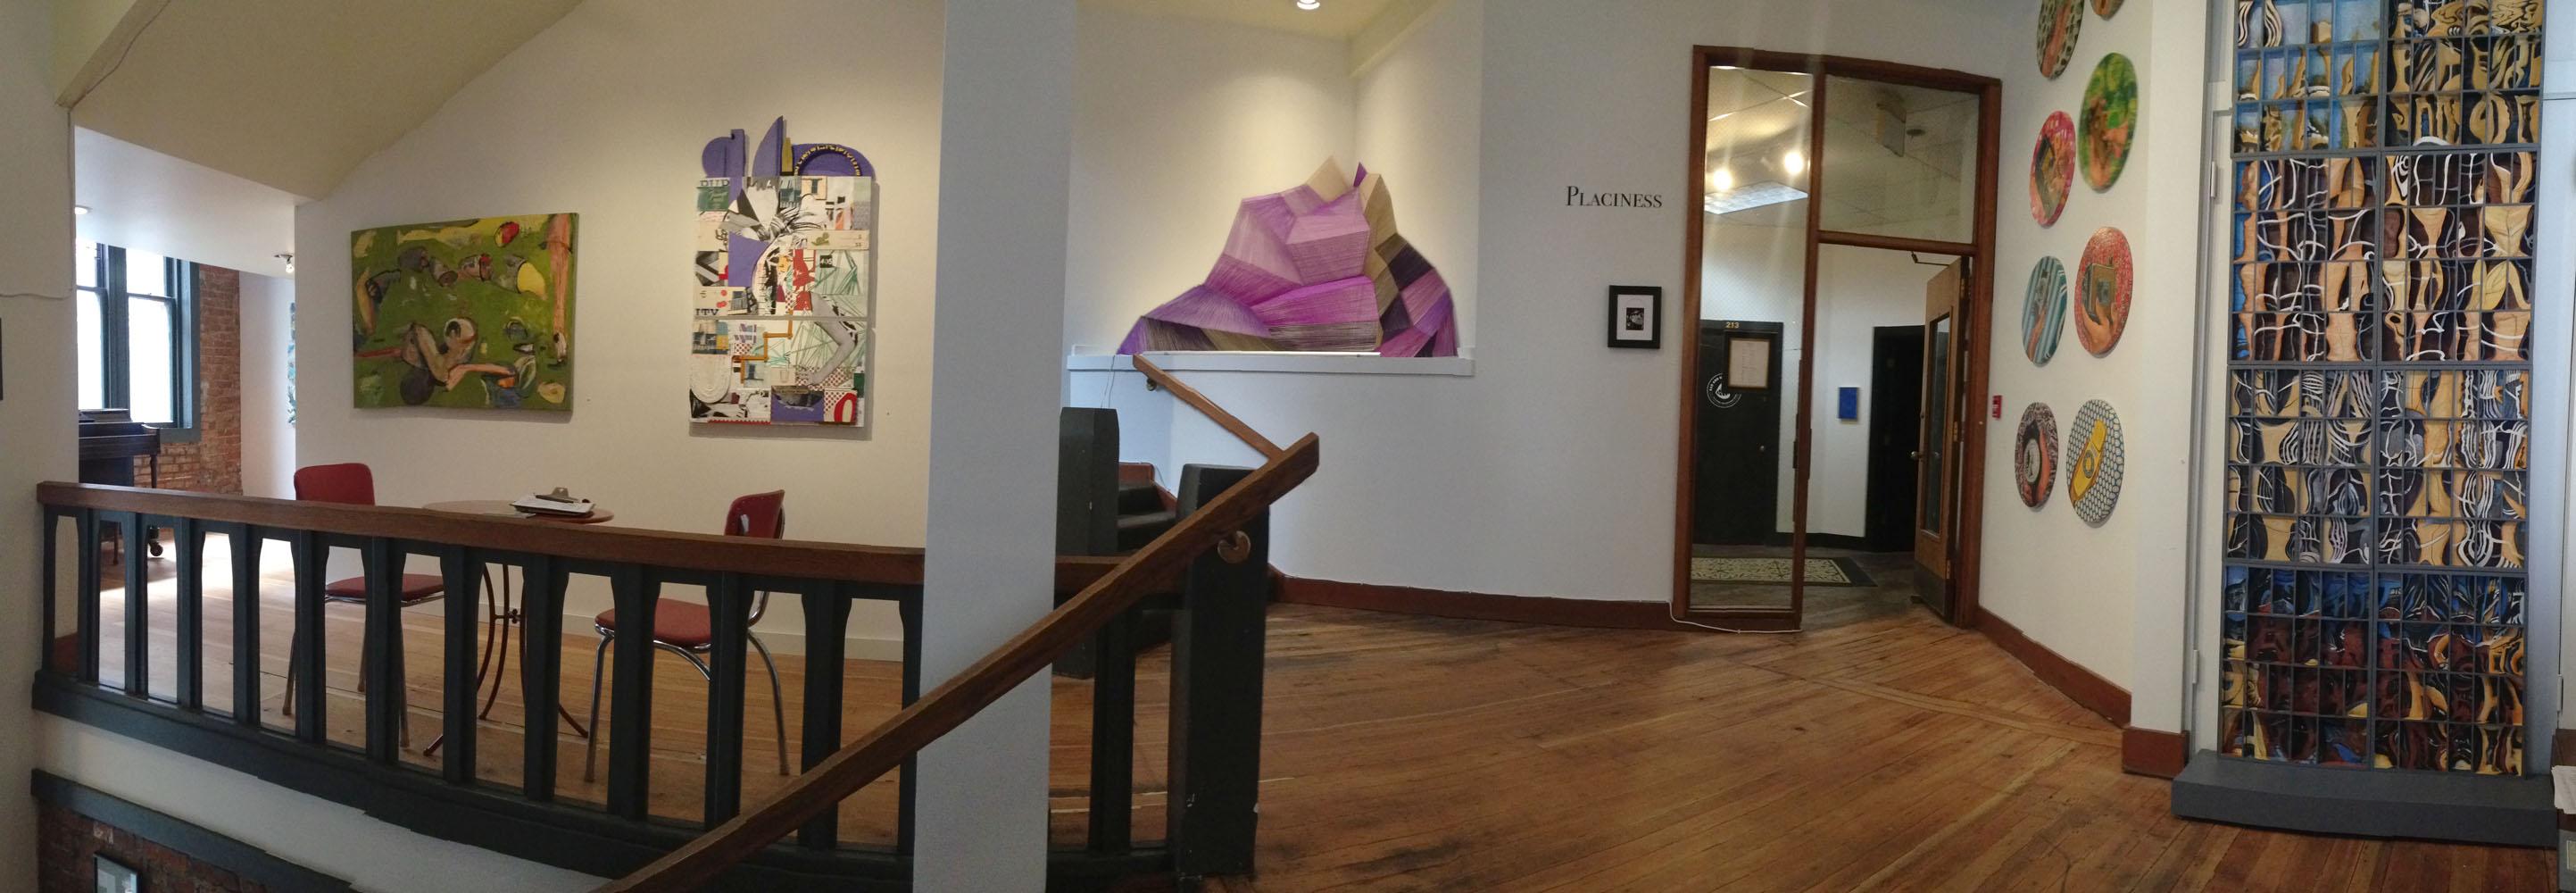 Placiness, '57 Biscayne, Good Arts Building